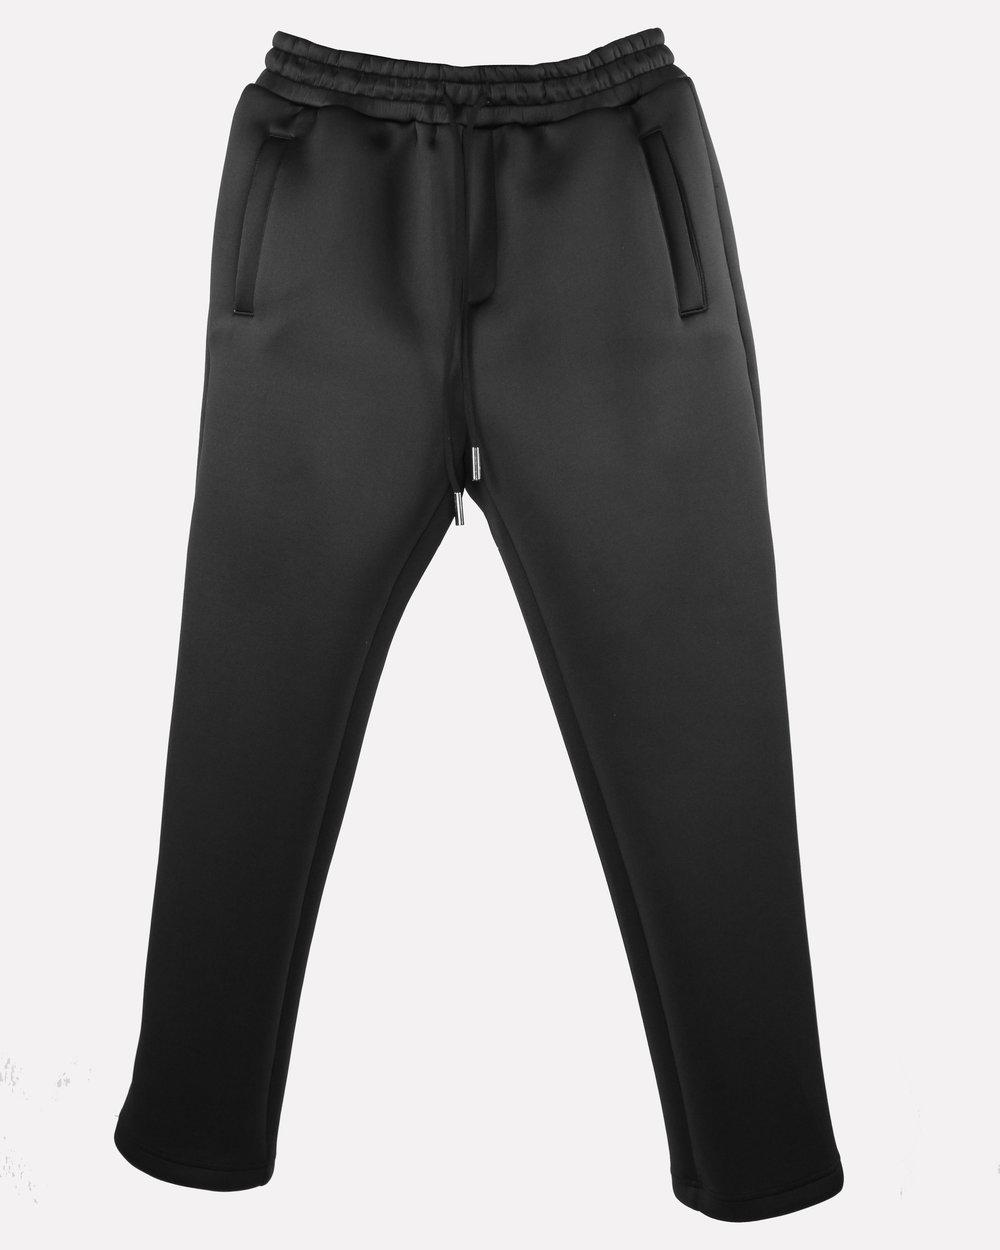 Pant Black Front.jpg